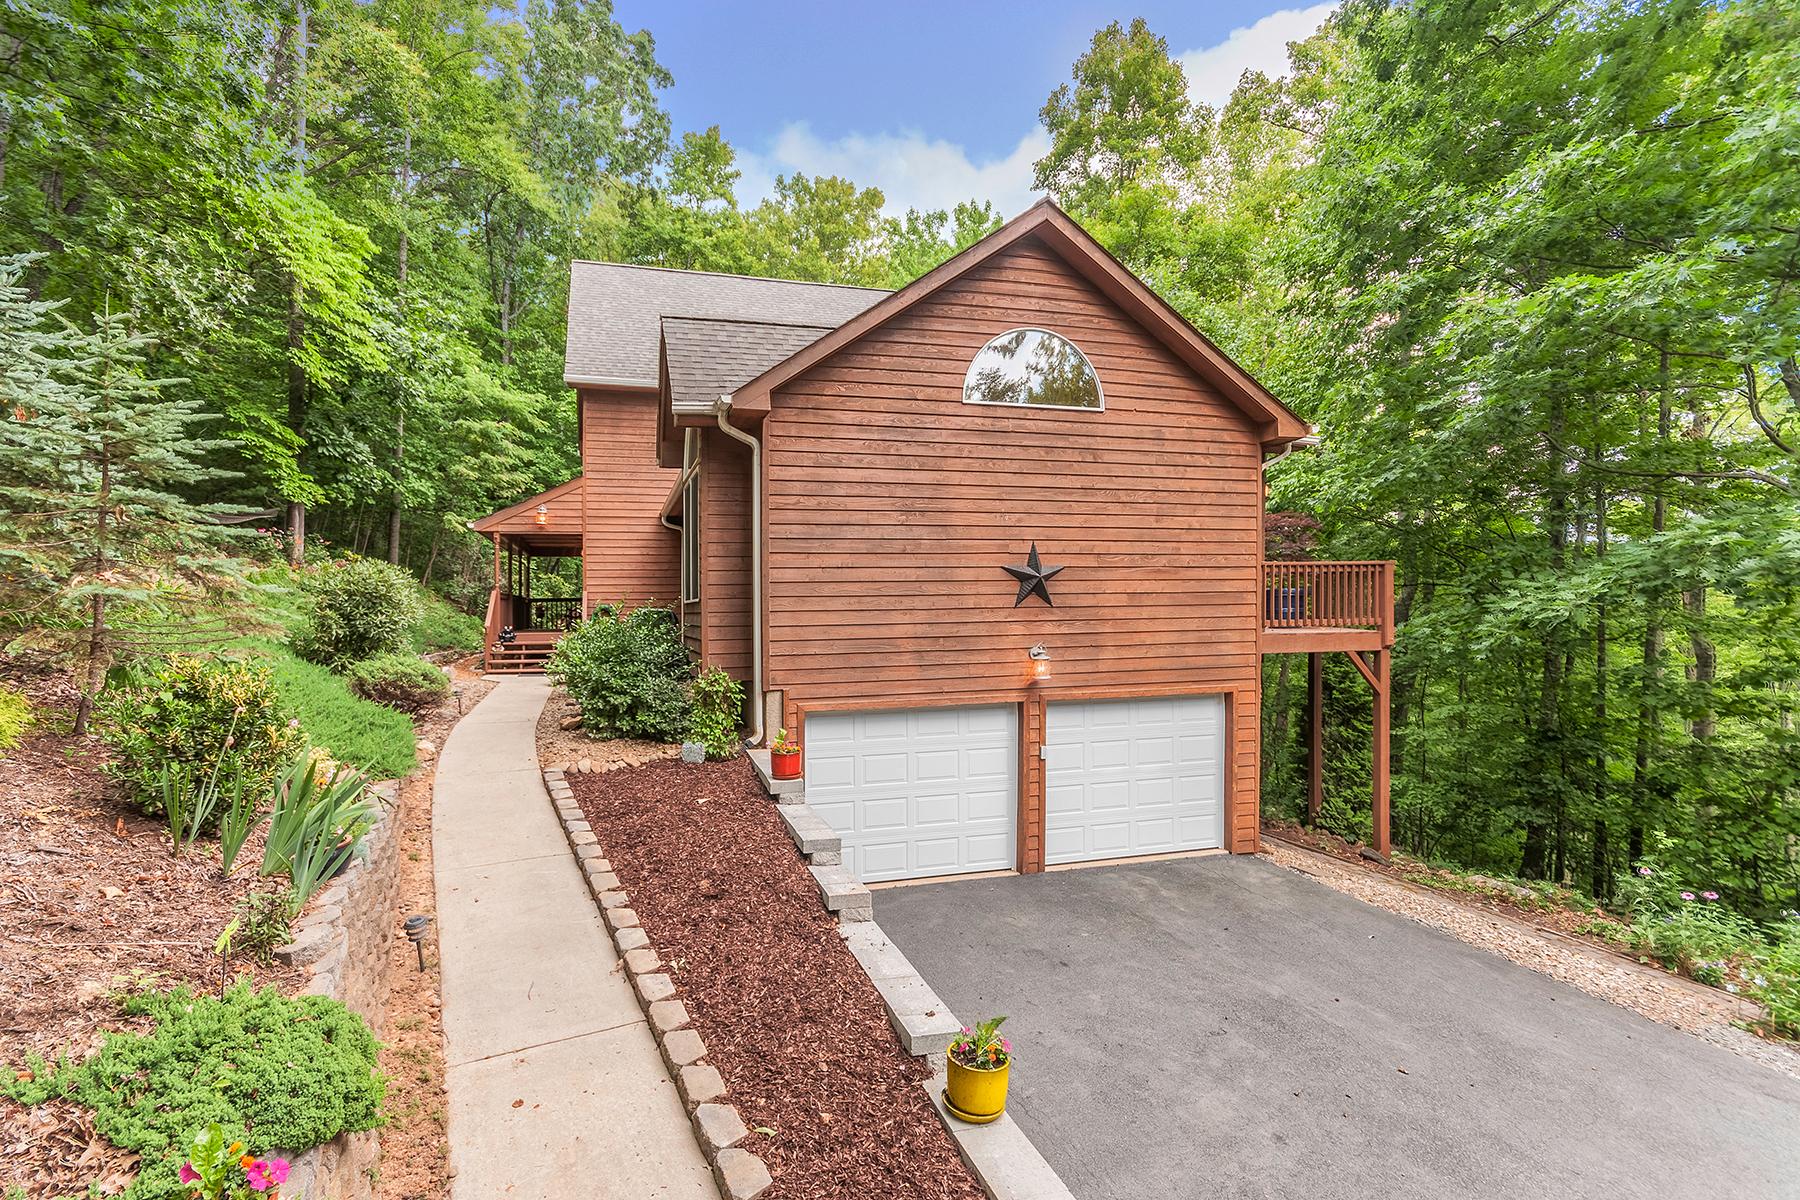 Single Family Home for Sale at BUFFALO MOUNTAIN 309 Mountain Laurel, Asheville, North Carolina 28805 United States